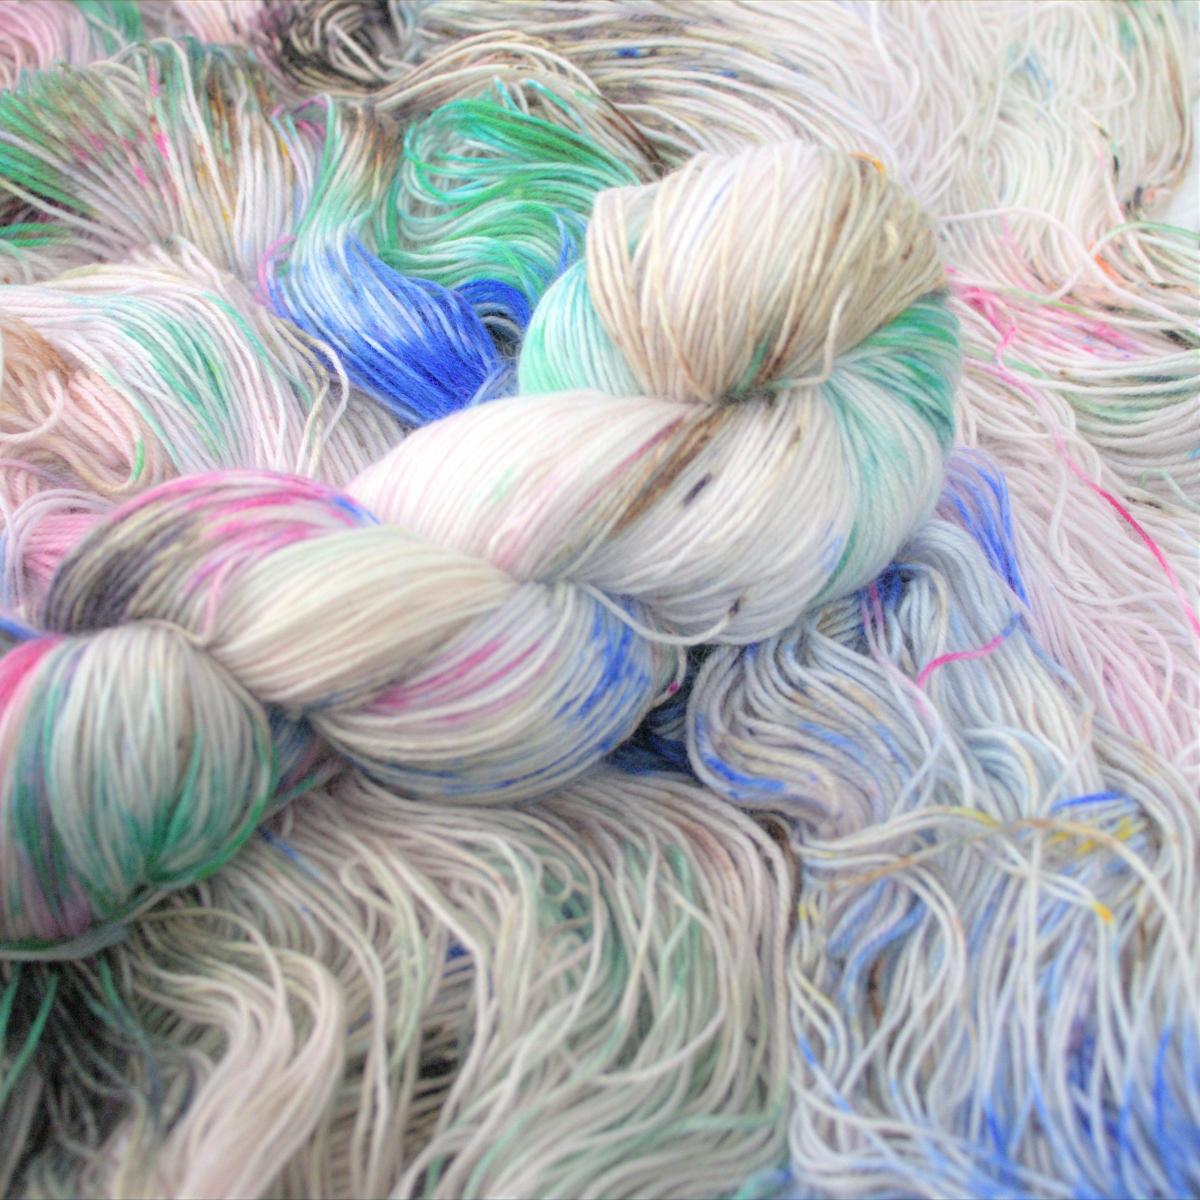 woodico.pro hand dyed yarn 047 copy 2 1200x1200 - Hand dyed yarn / 048